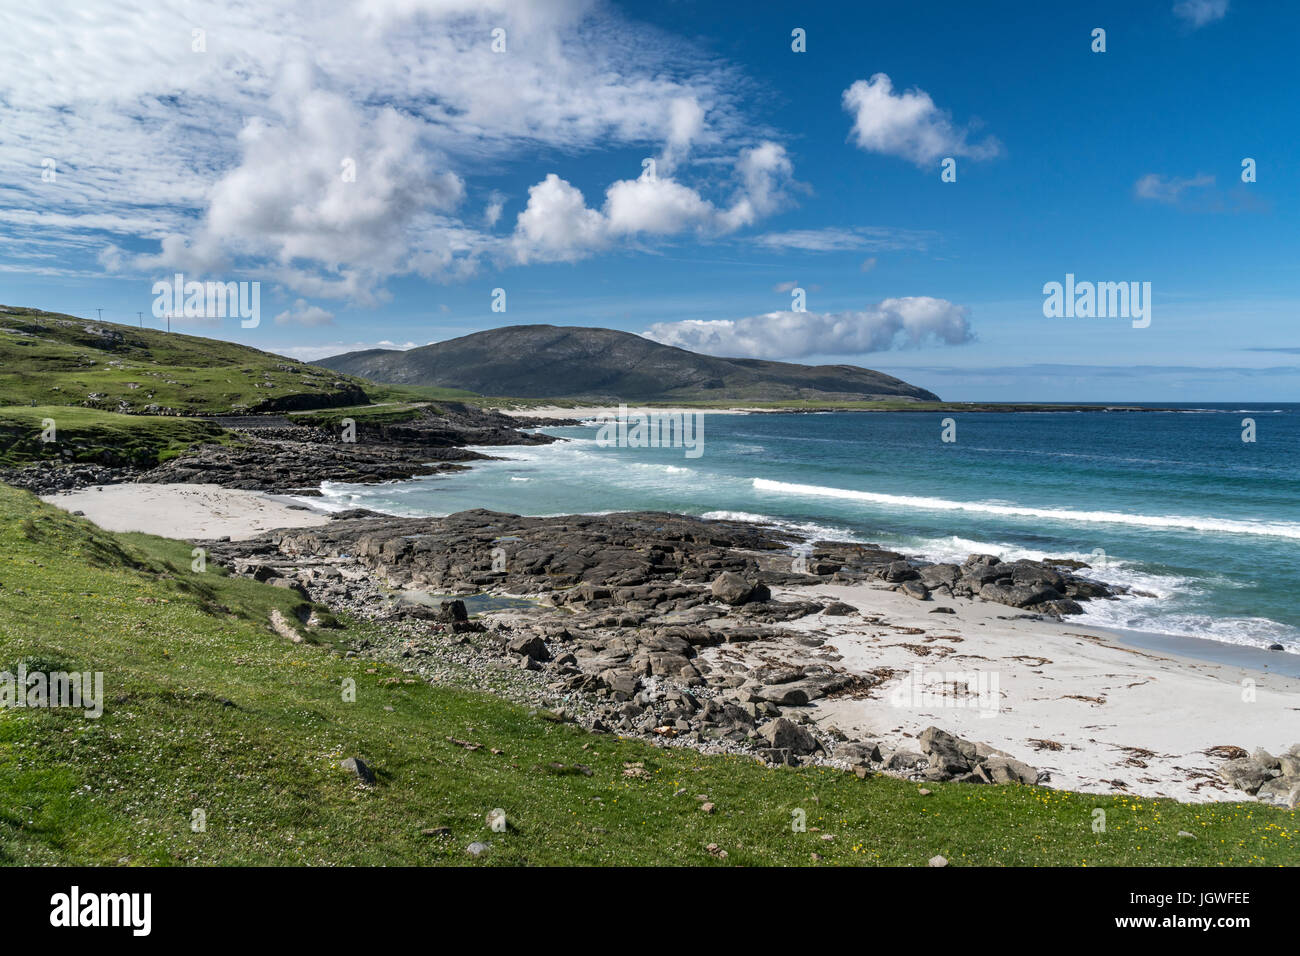 Hebridean Beach - Stock Image